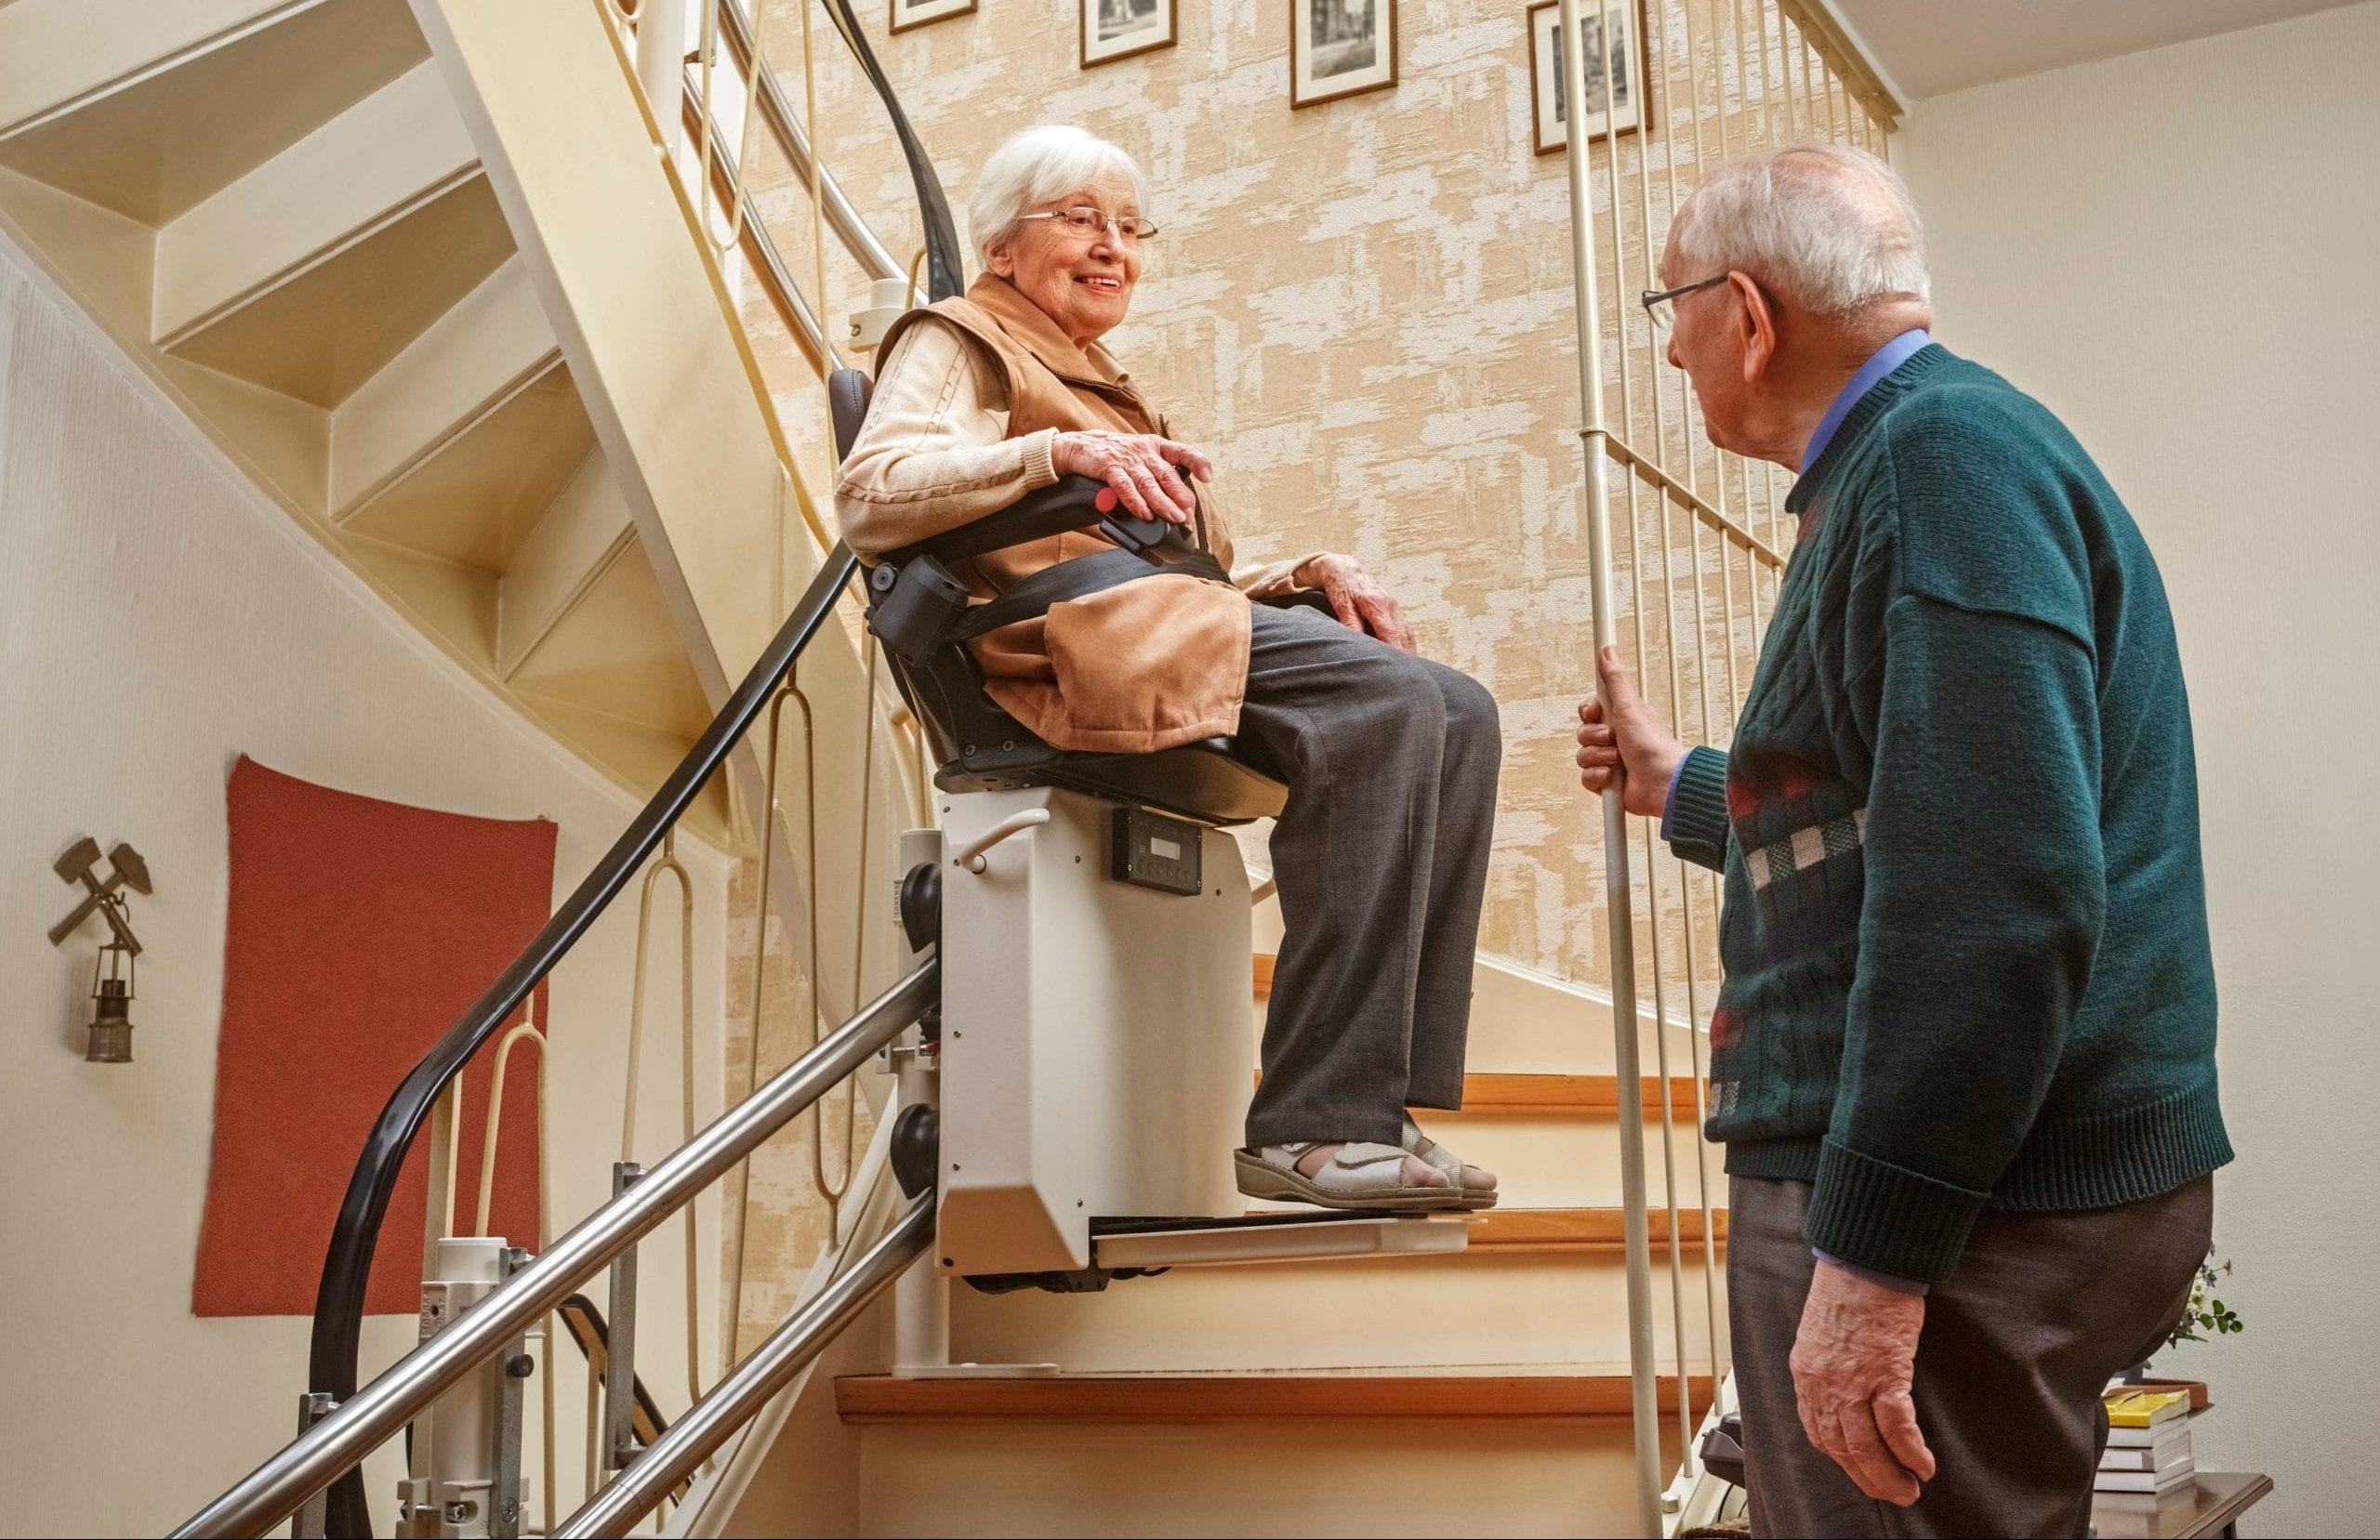 Älteres Ehepaar mit Treppenlift im Eigenheim.